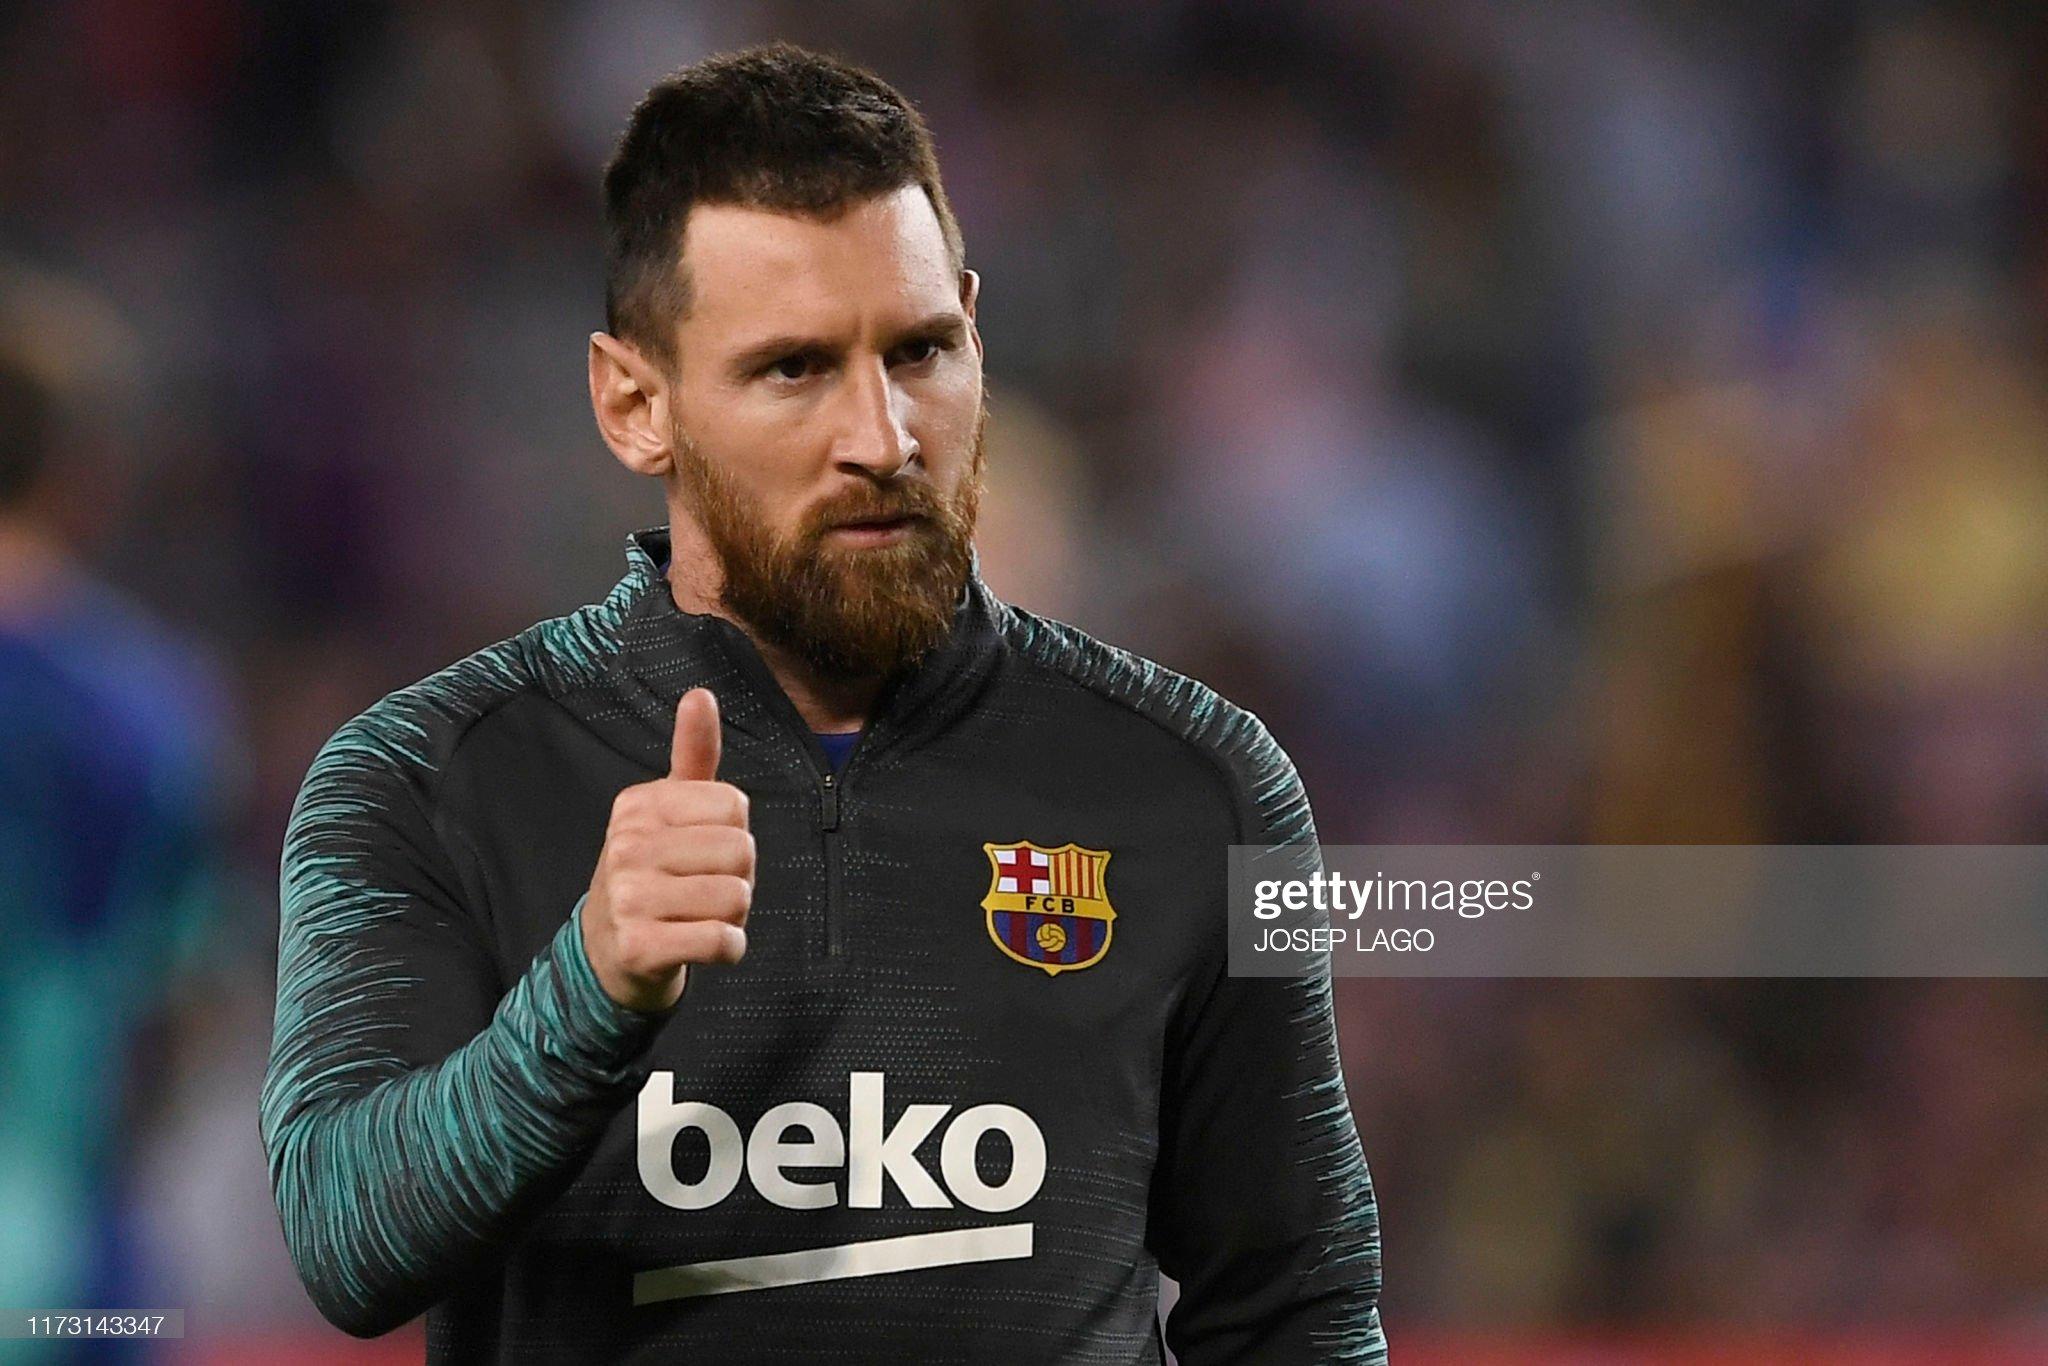 صور مباراة : برشلونة - إنتر 2-1 ( 02-10-2019 )  Barcelonas-argentine-forward-lionel-messi-warms-up-before-the-uefa-picture-id1173143347?s=2048x2048